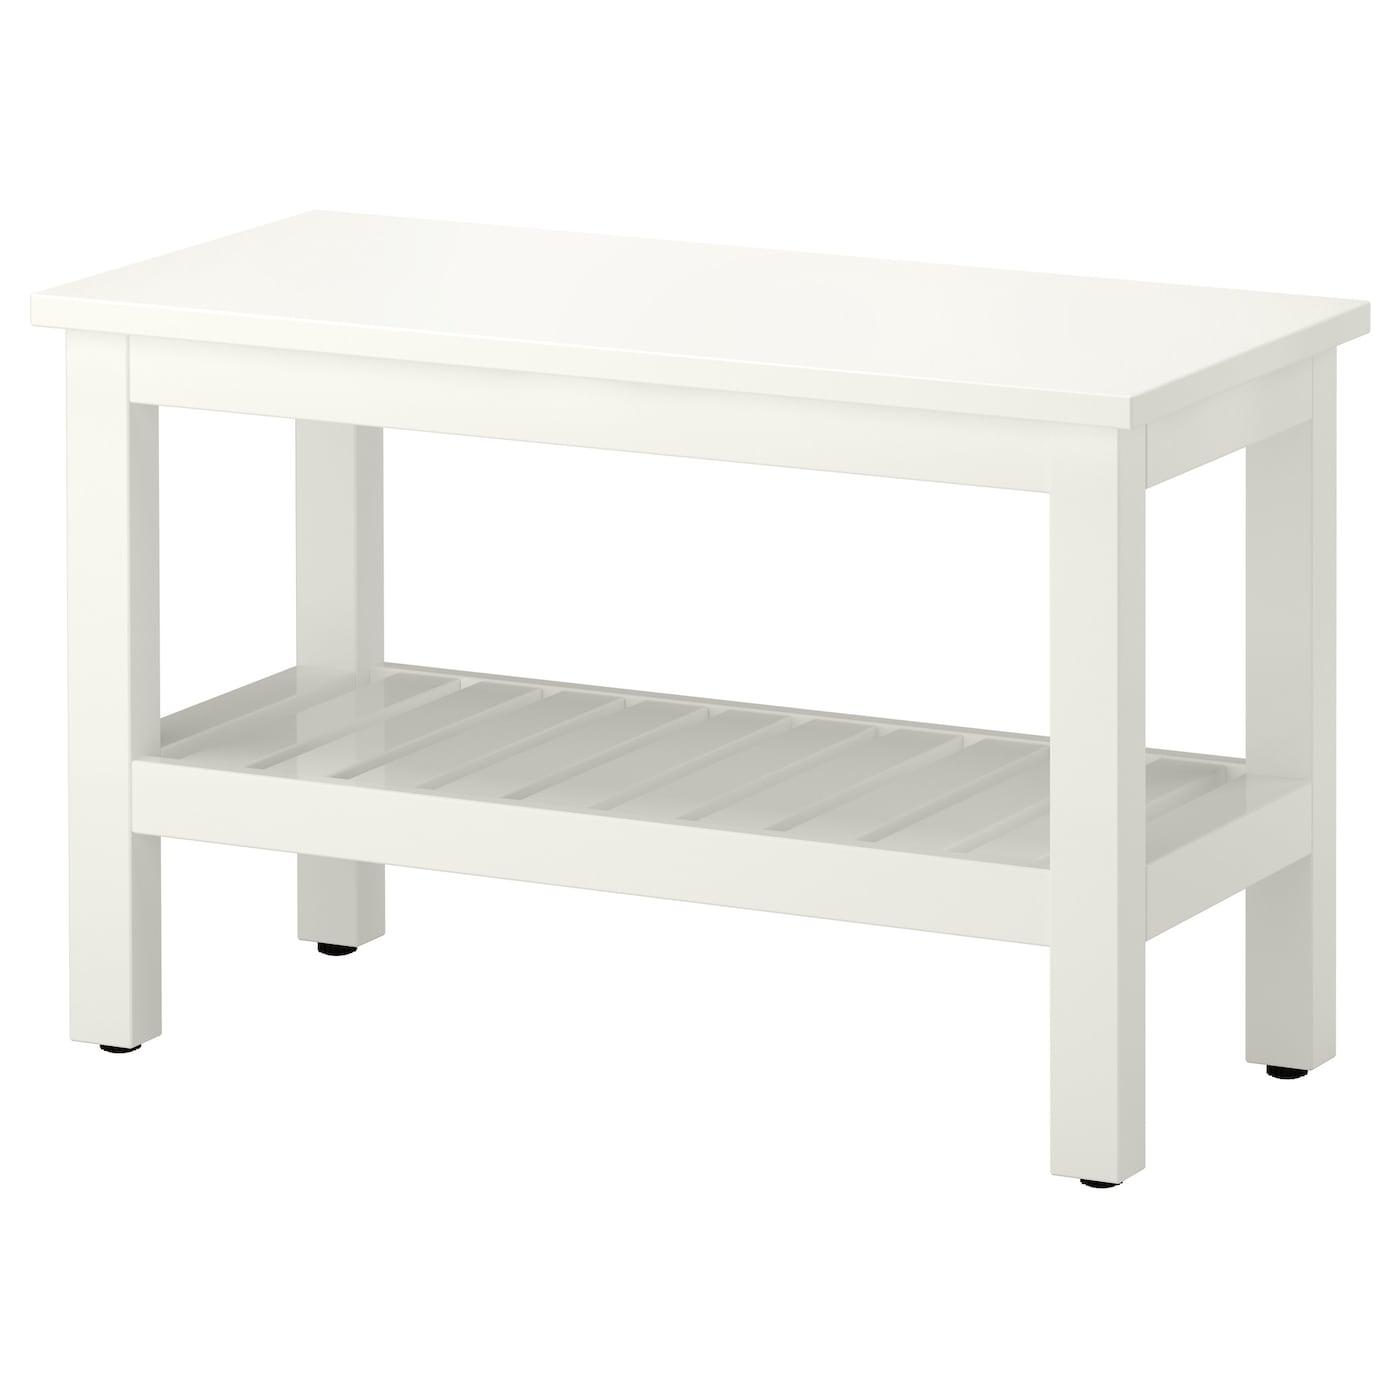 Inspiring Banc Salle De Bains Ikea